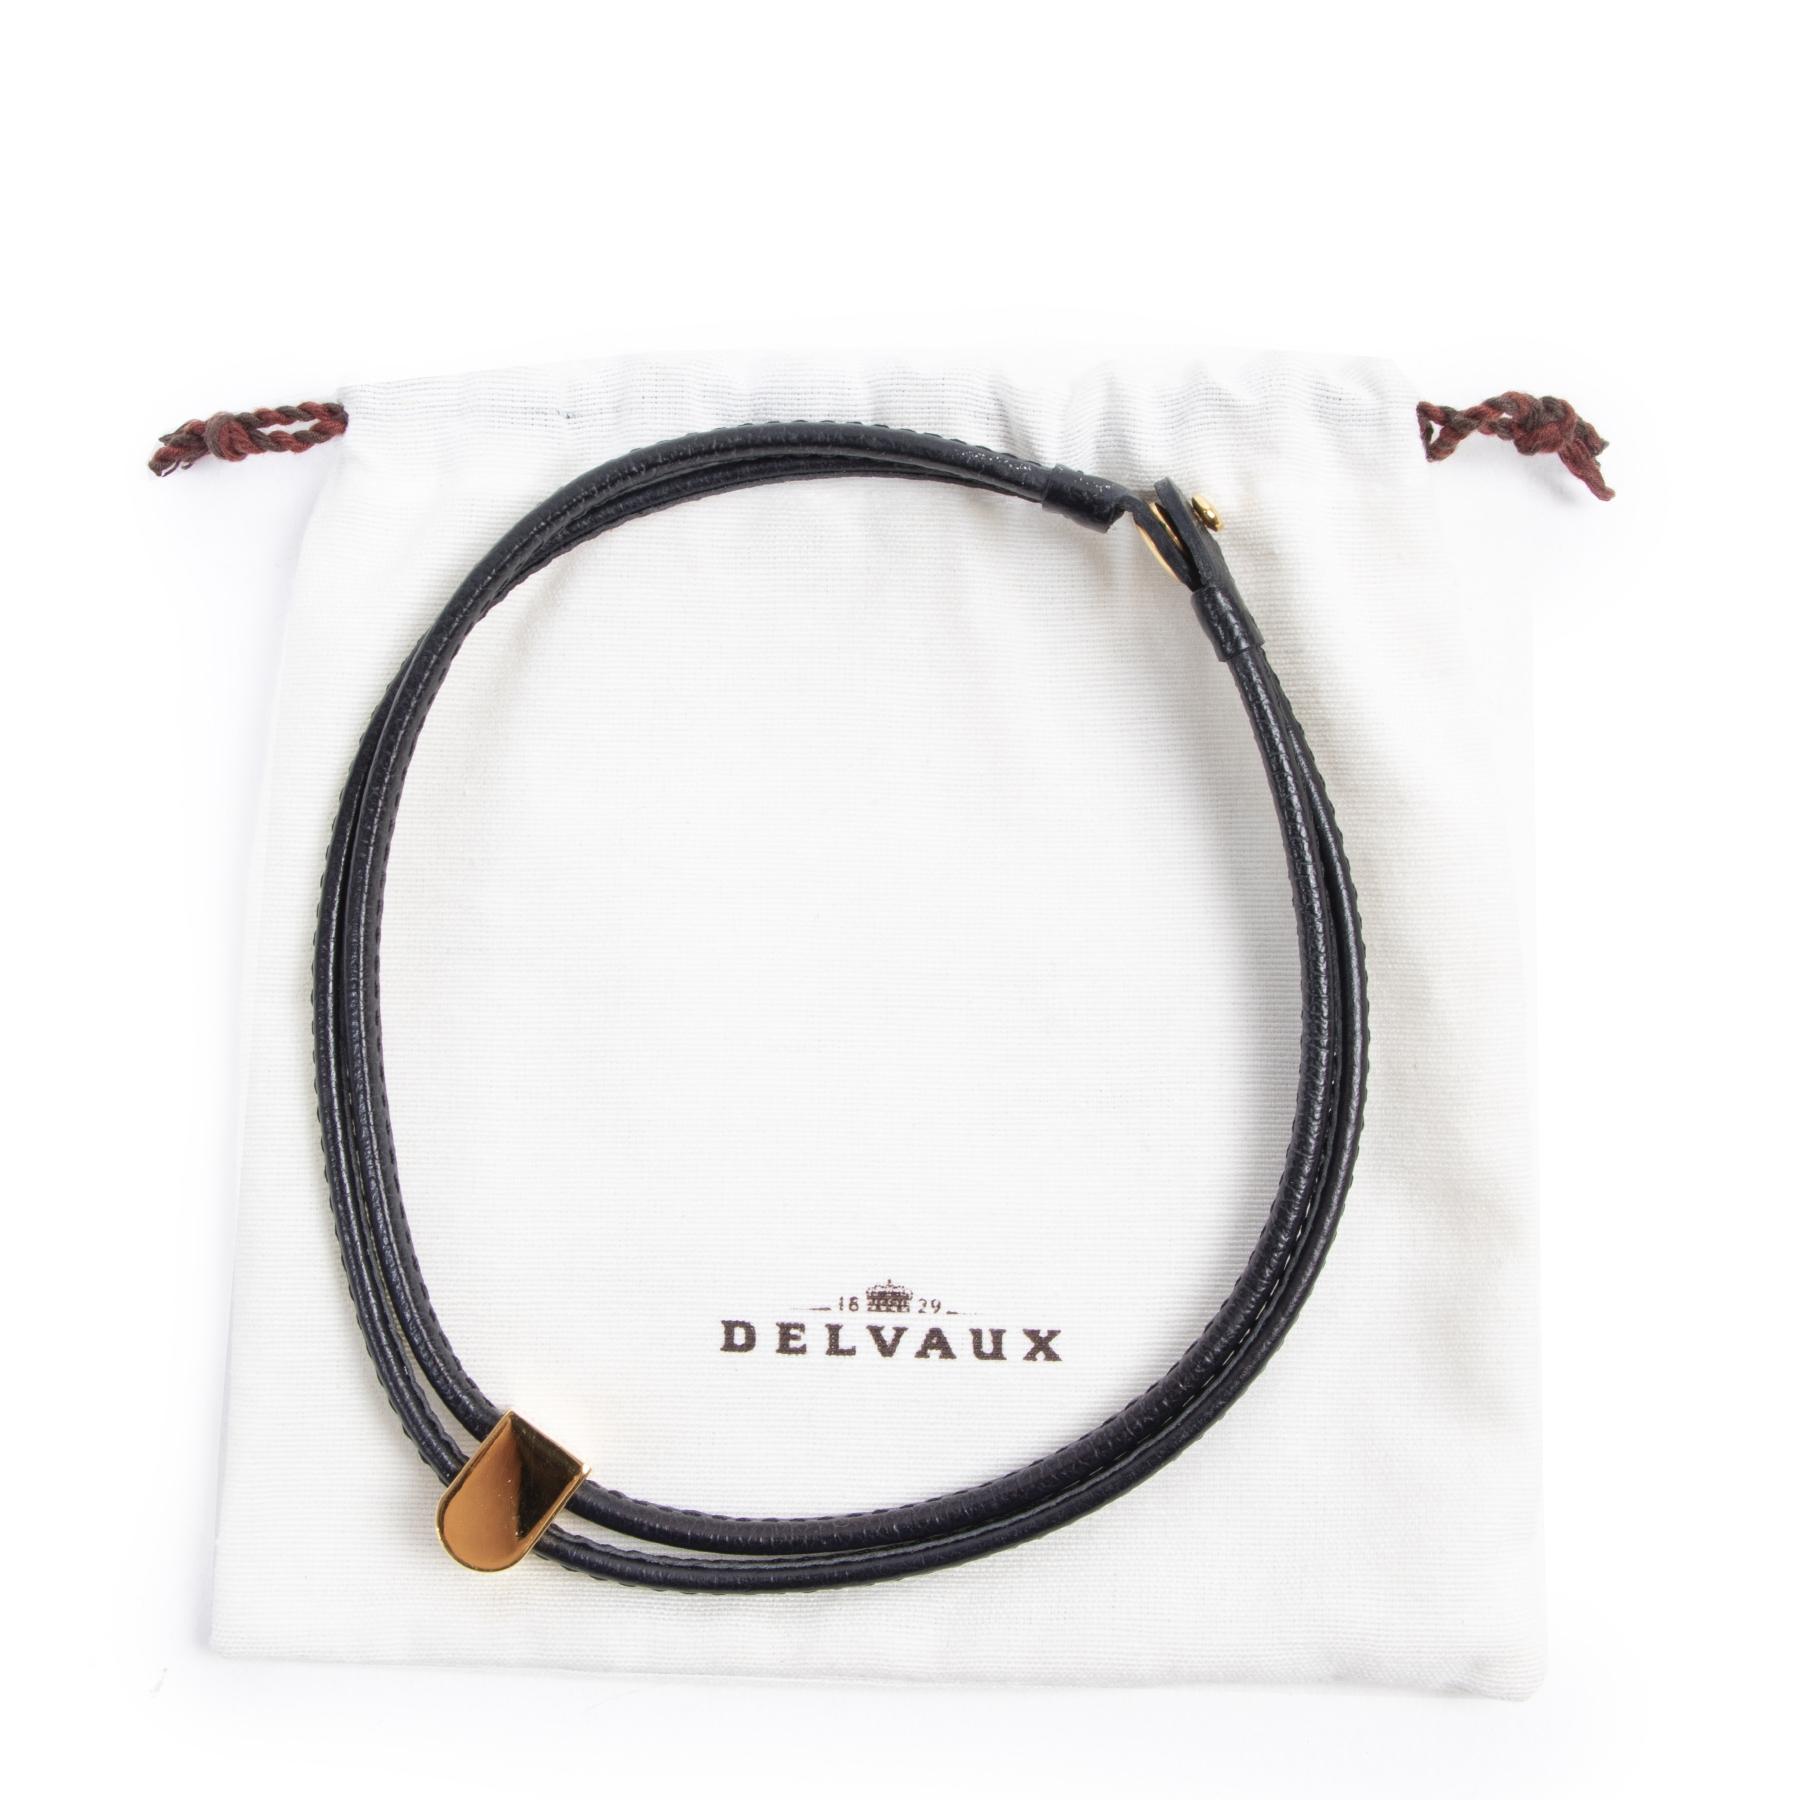 Authentic secondhand Delvaux Black Leather D Necklace designer accessories luxury vintage webshop fashion safe secure online shopping